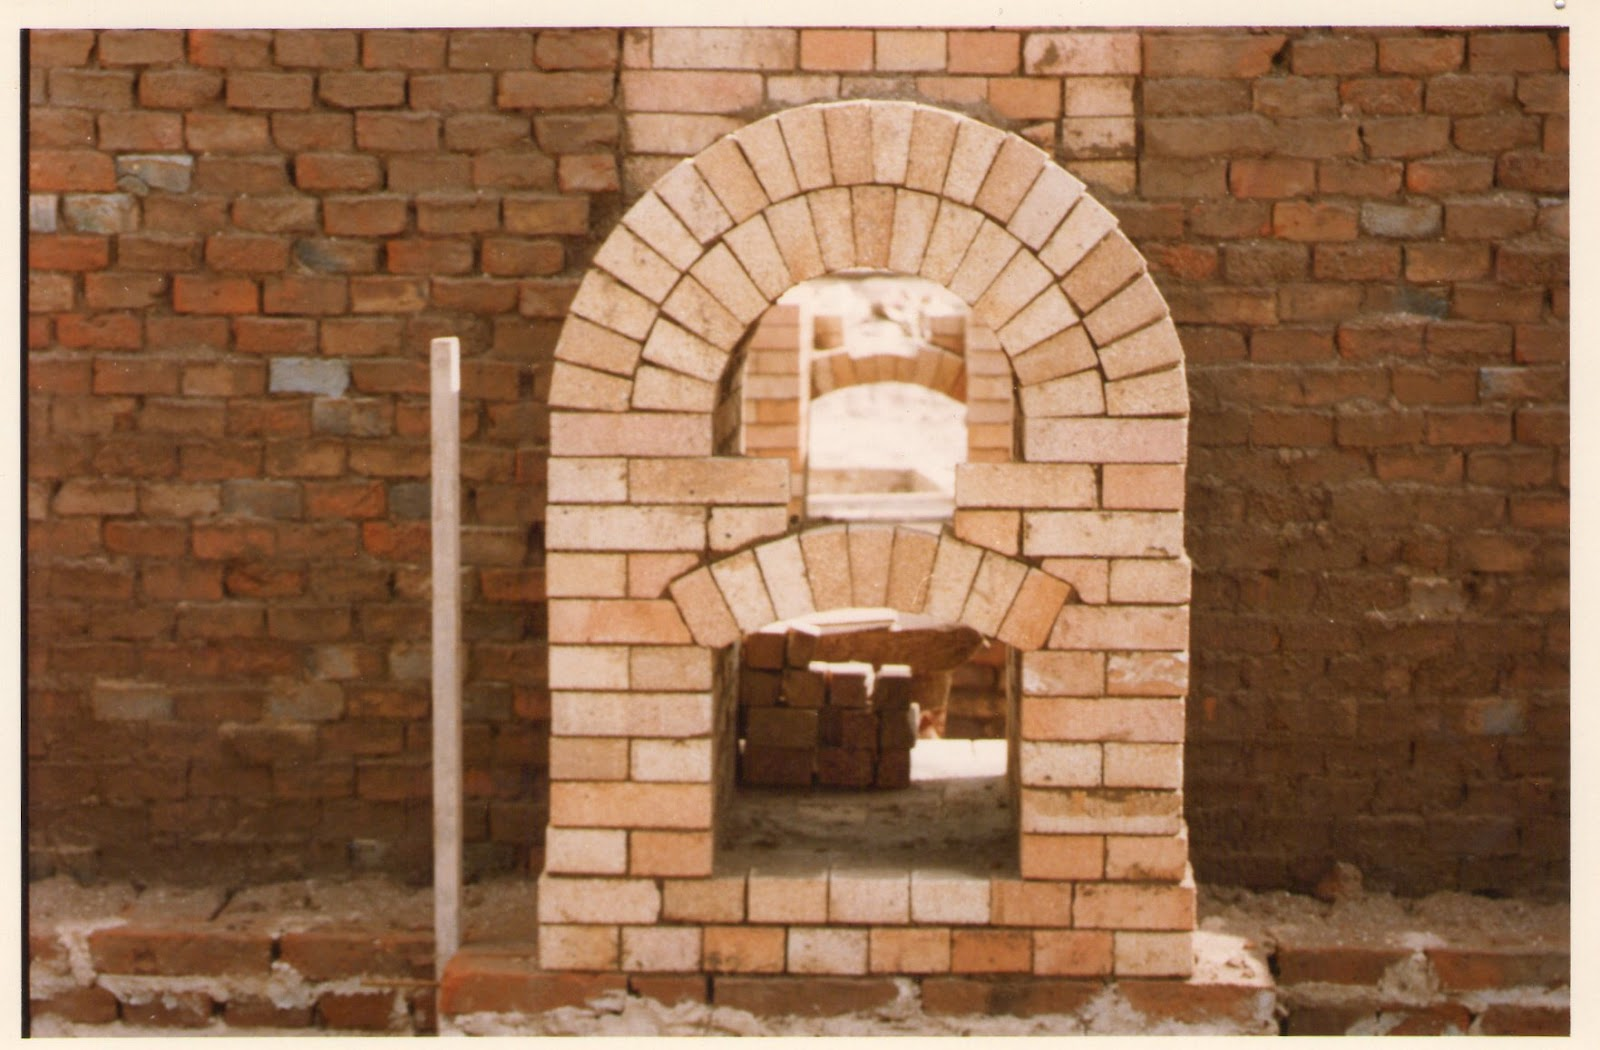 Ladrillos refractarios para horno images - Horno de ladrillo ...